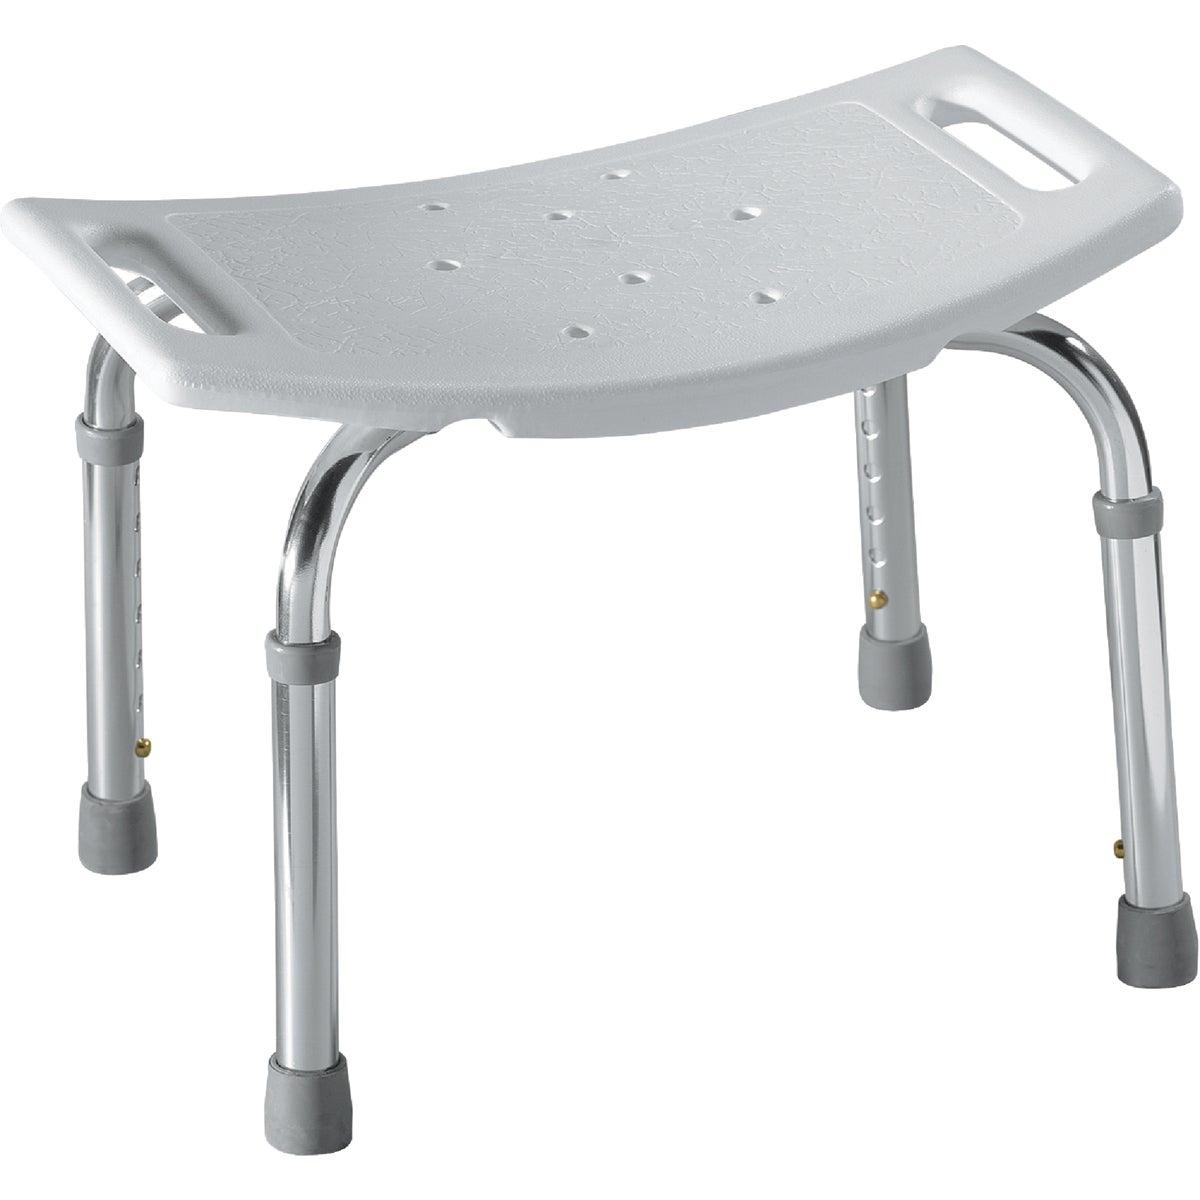 ADJUSTABLE SHOWER SEAT - DN7025 by C S I Donner